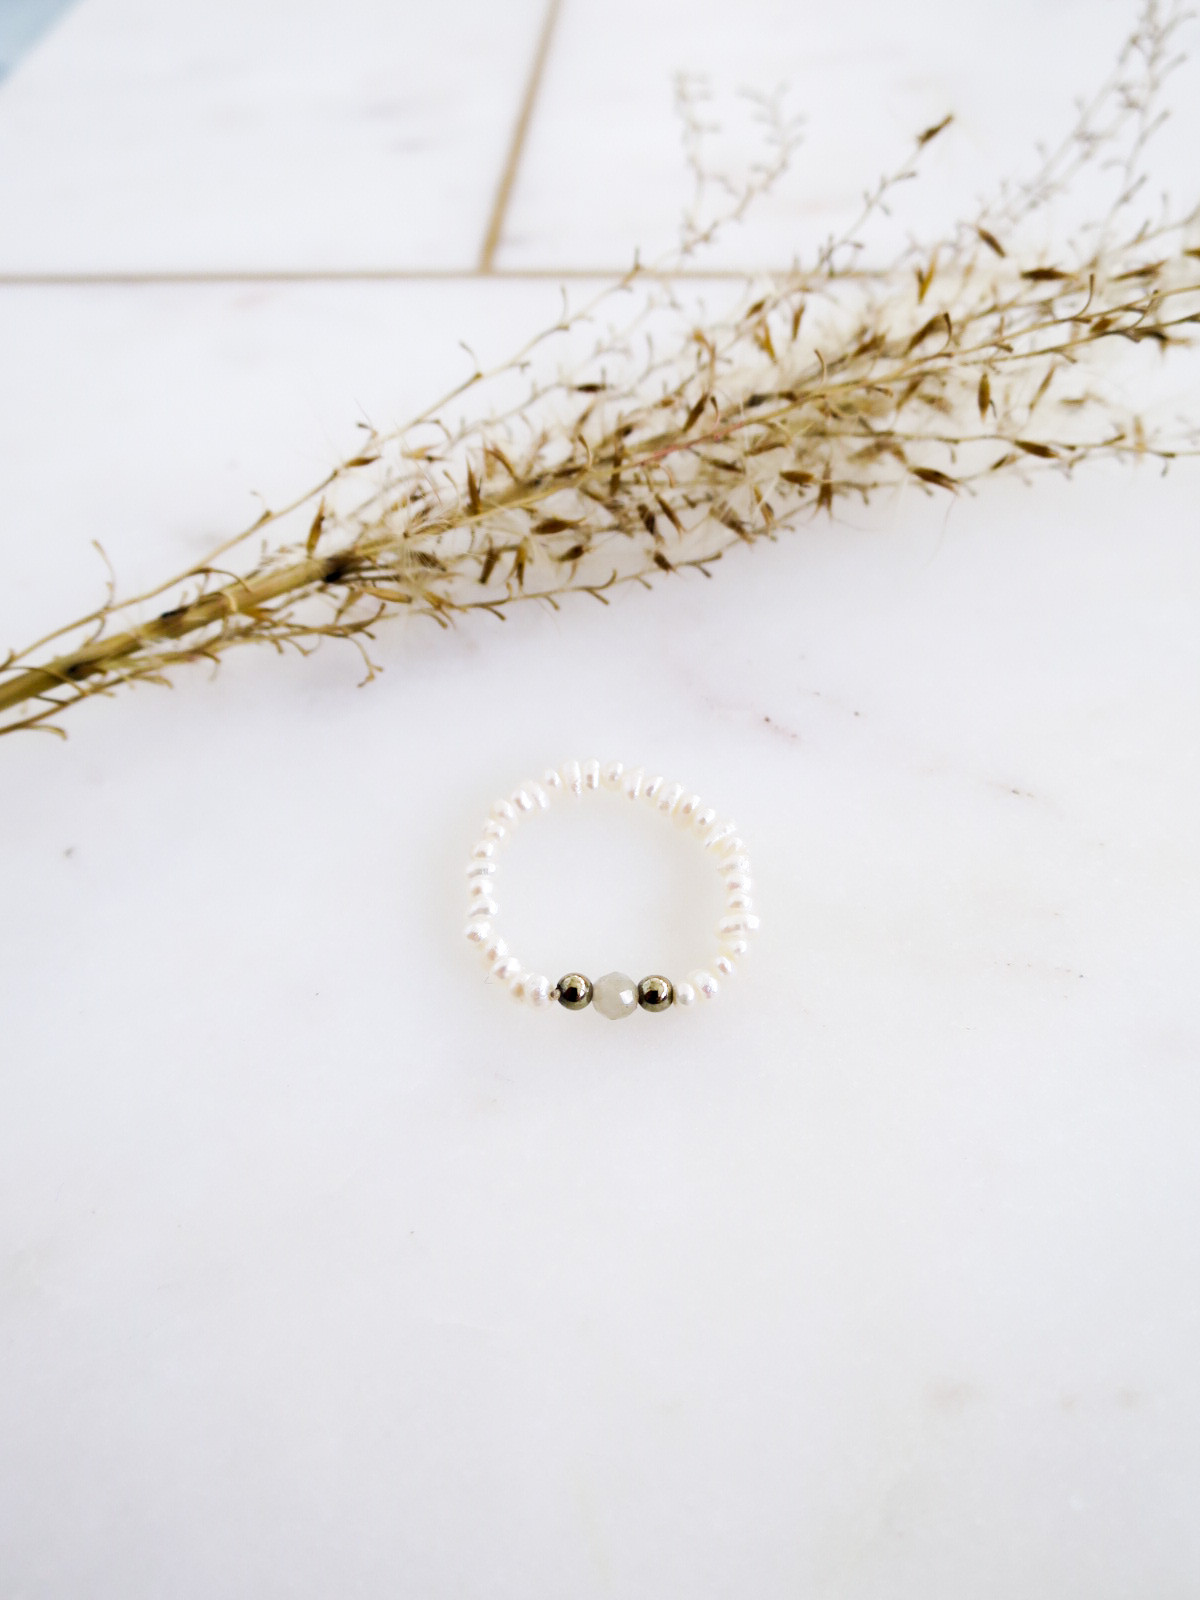 Pearl ring no.2 - Makostone